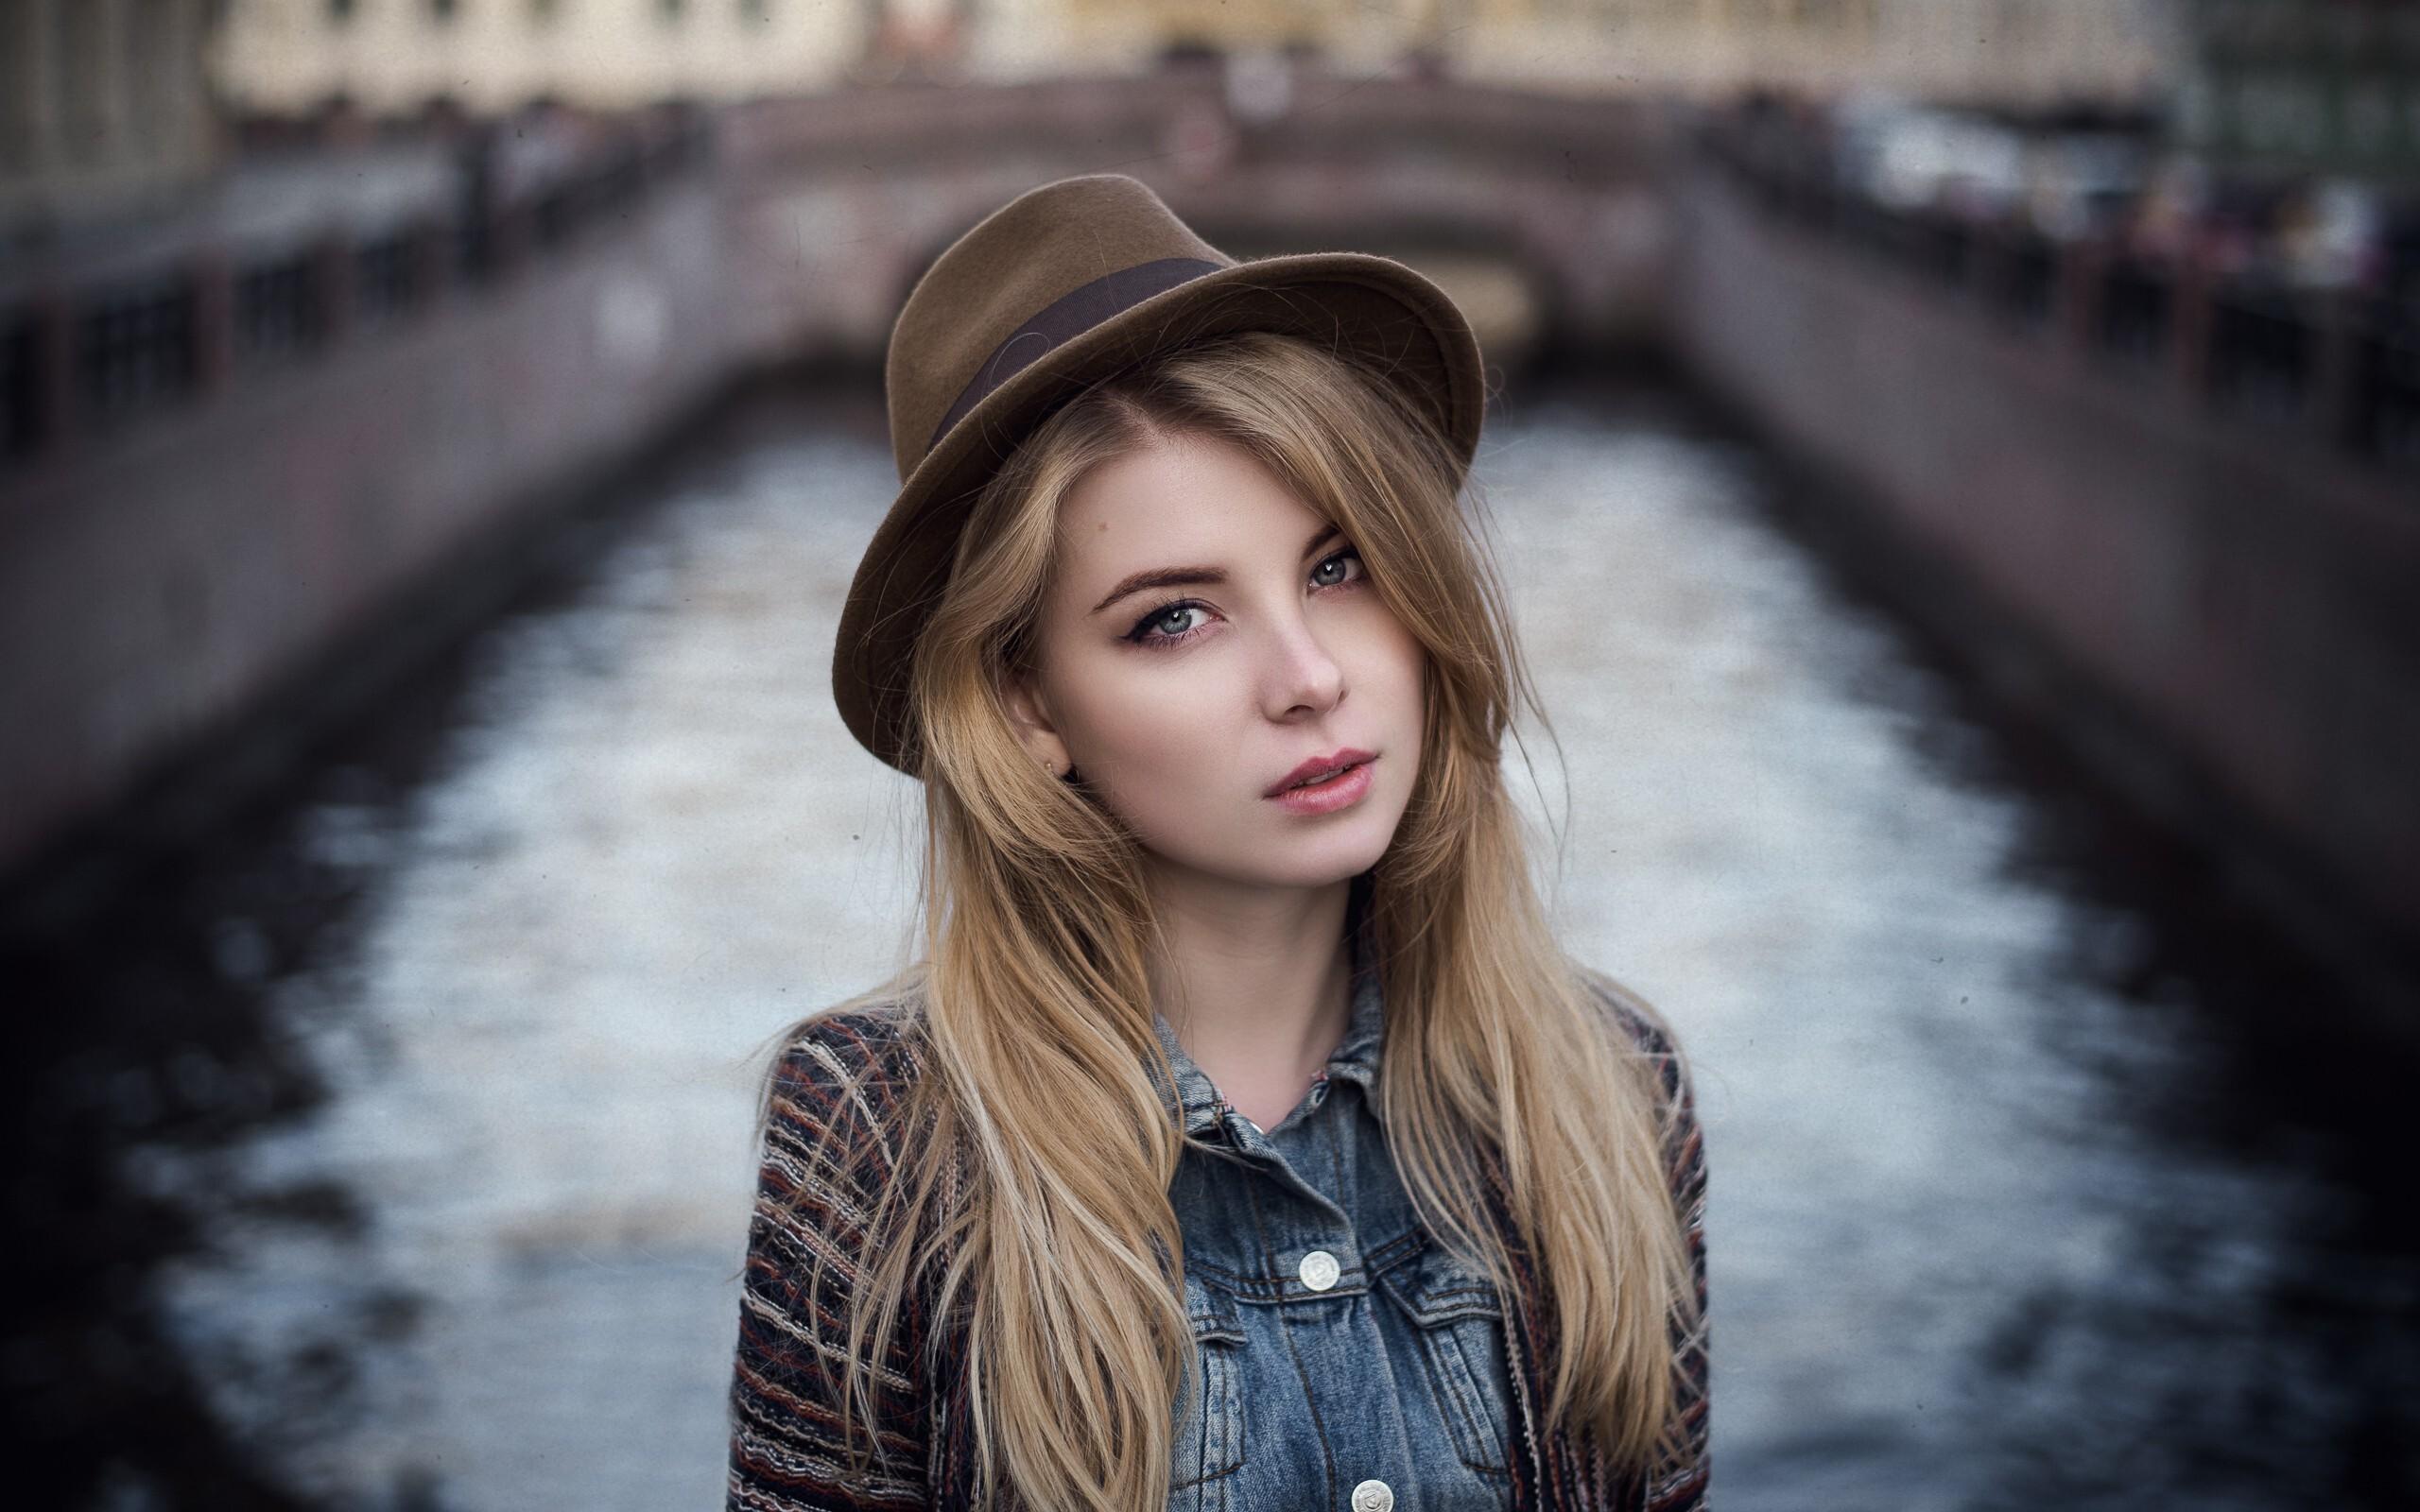 irina-popova-hat-face-image.jpg